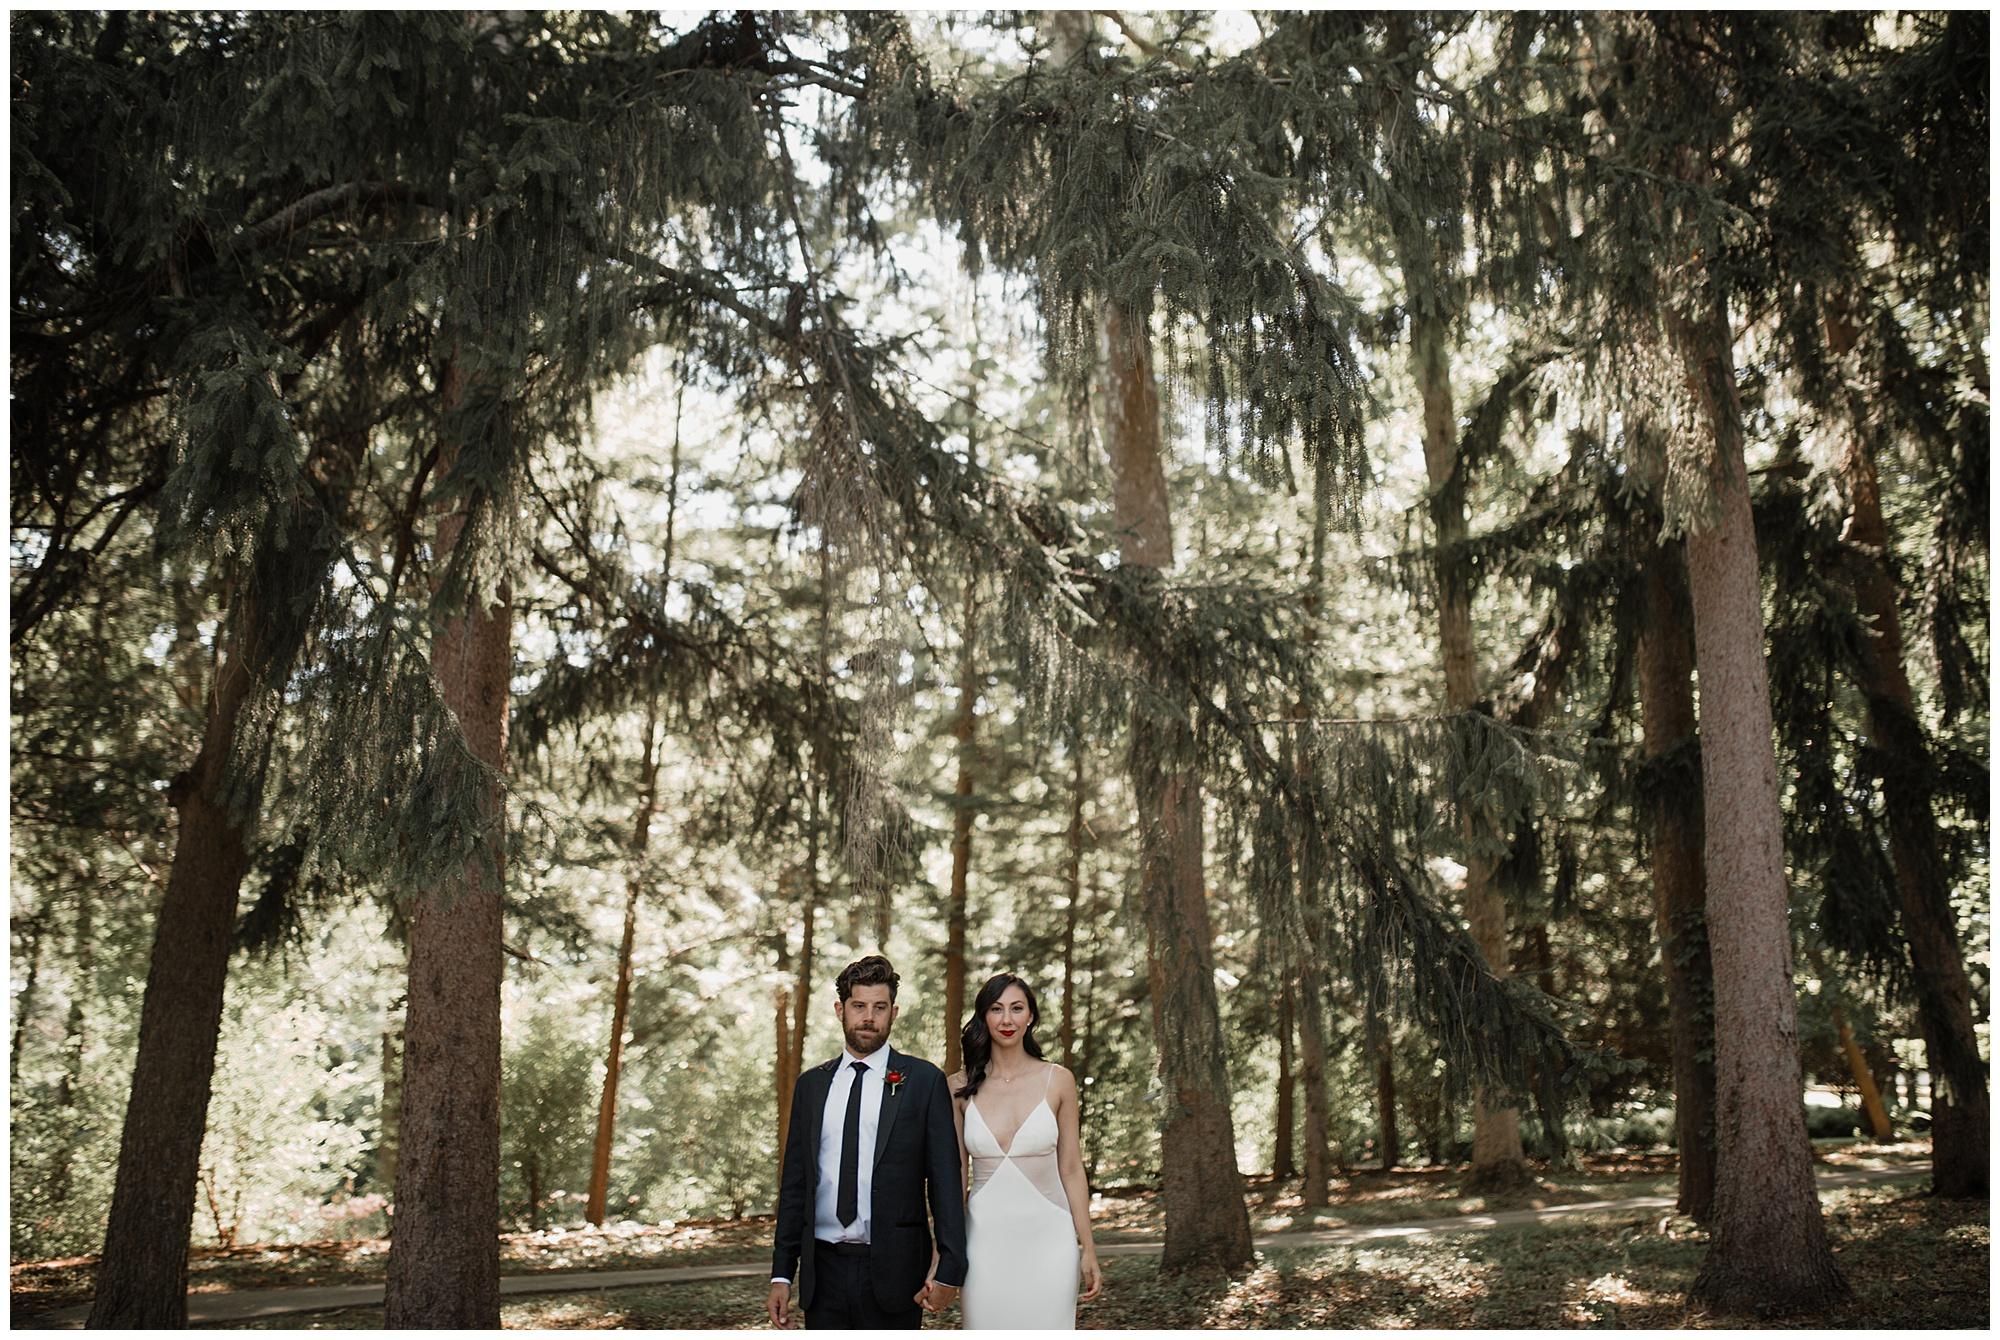 allerton_park_wedding_champaign_il_chicago_wright_photographs_ne_0084.jpg